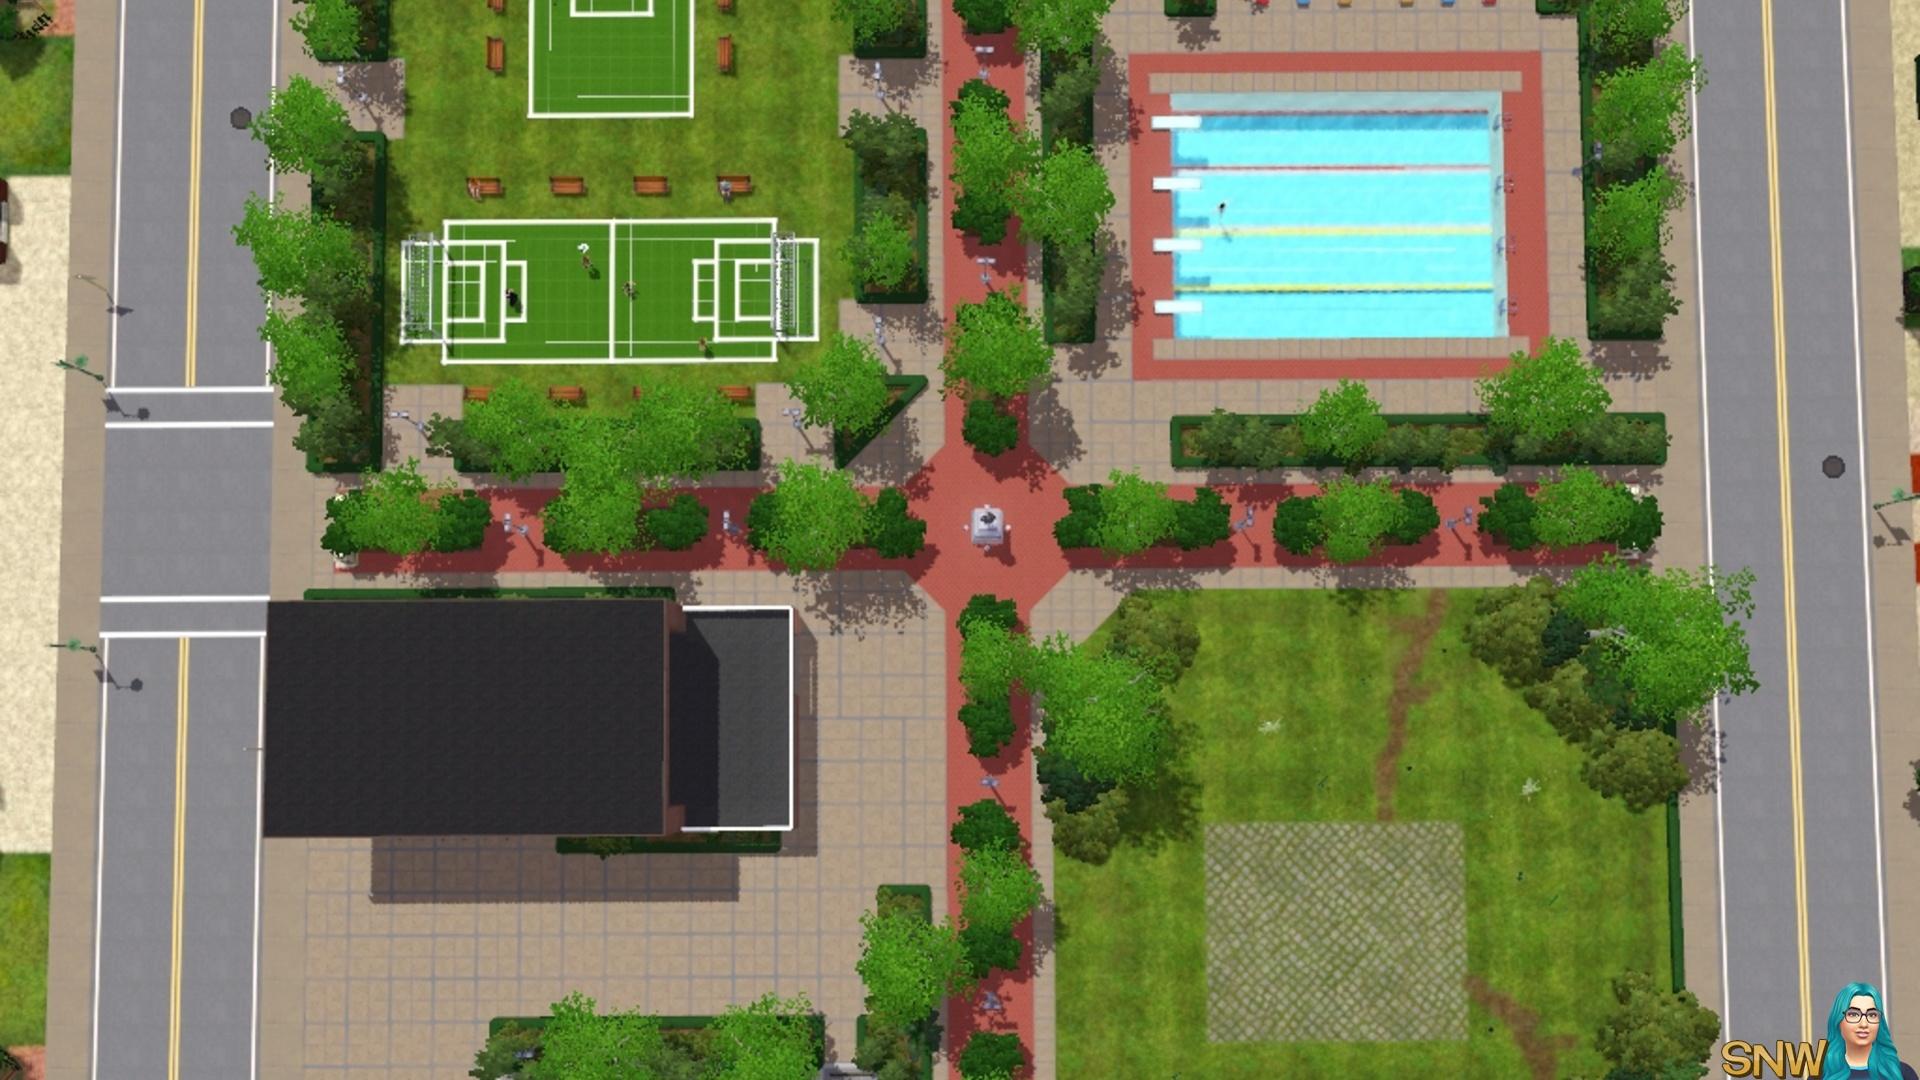 The Green Sunshine Sports Park